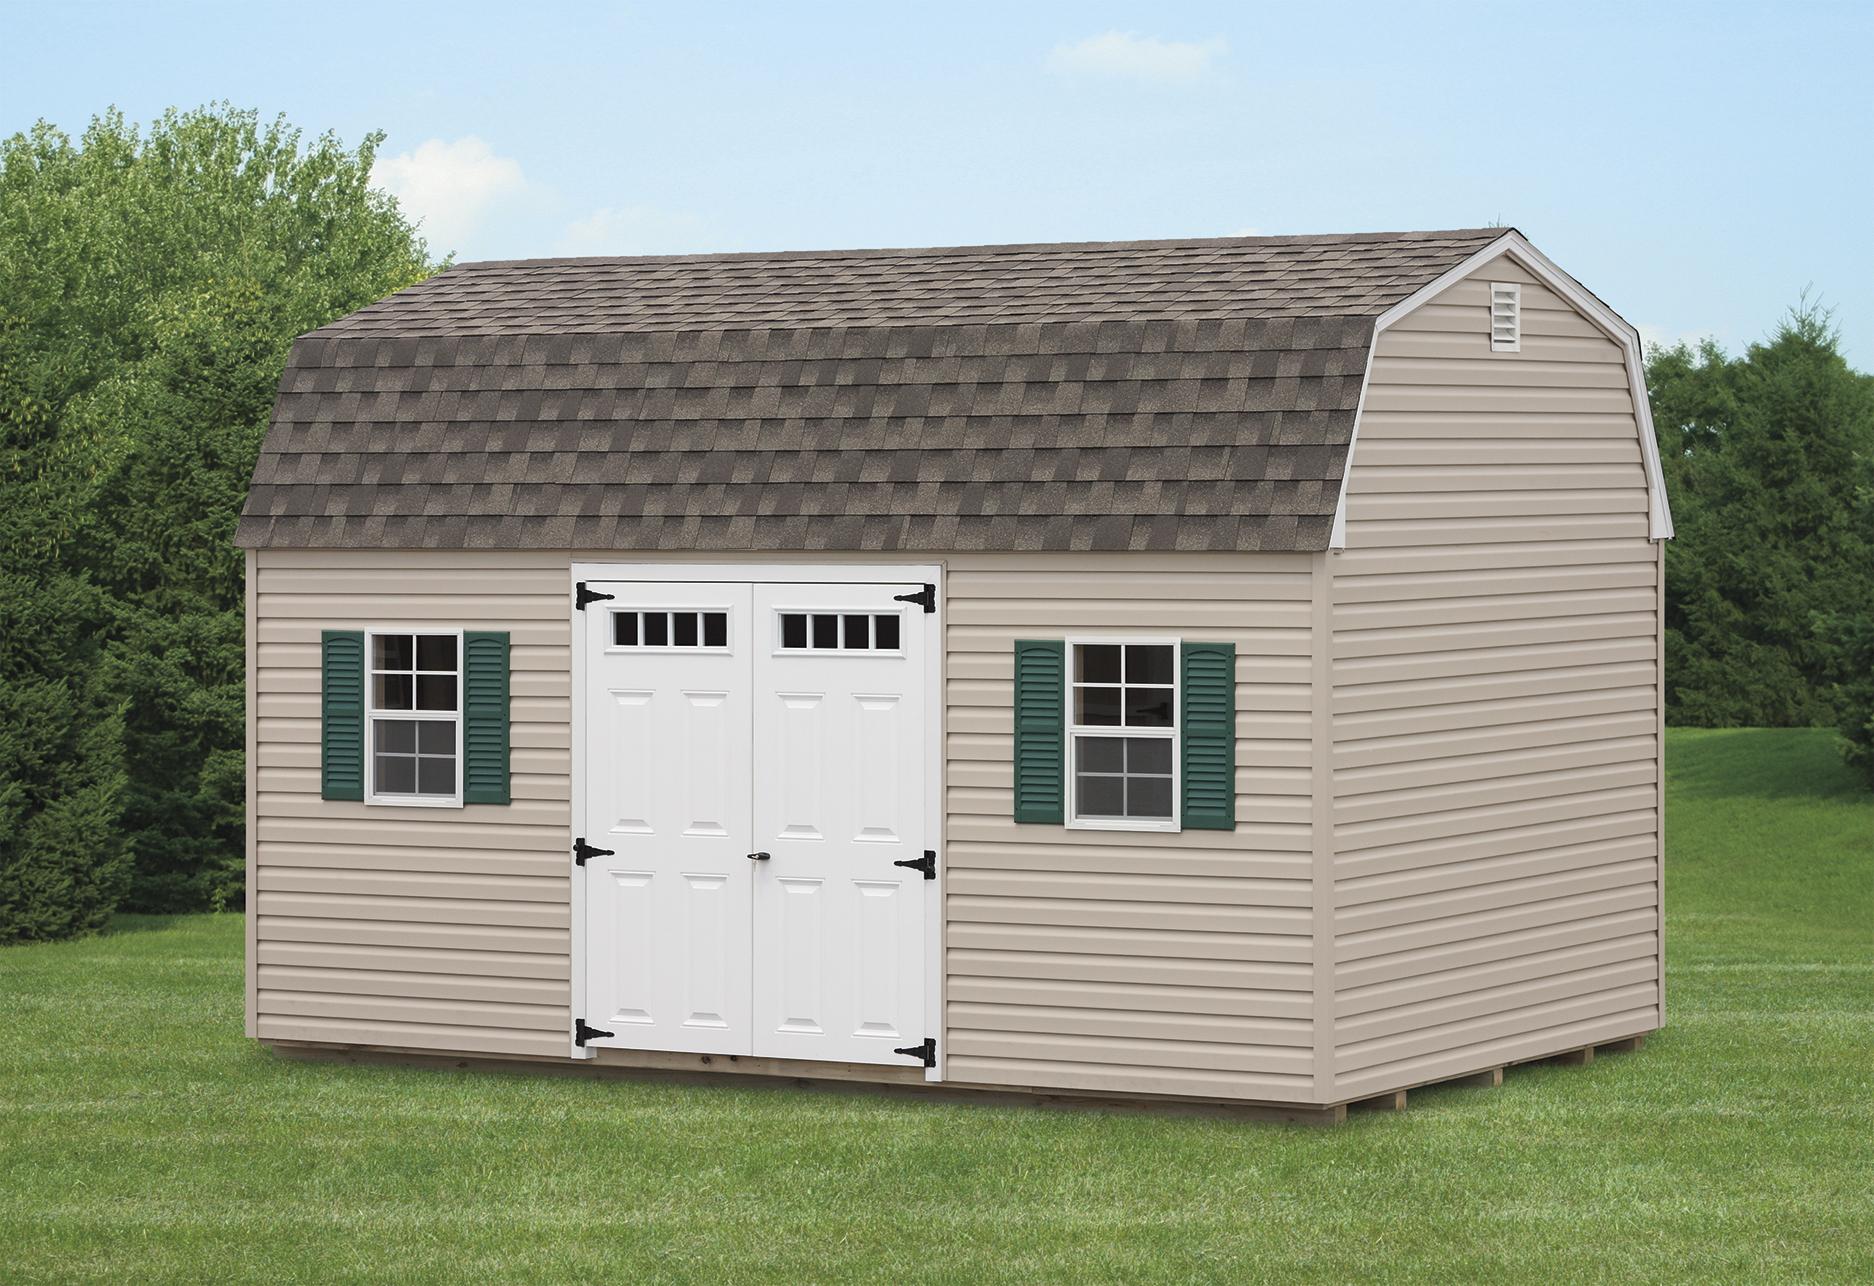 Economy Dutch Barn Vinyl Amish Backyard Structures